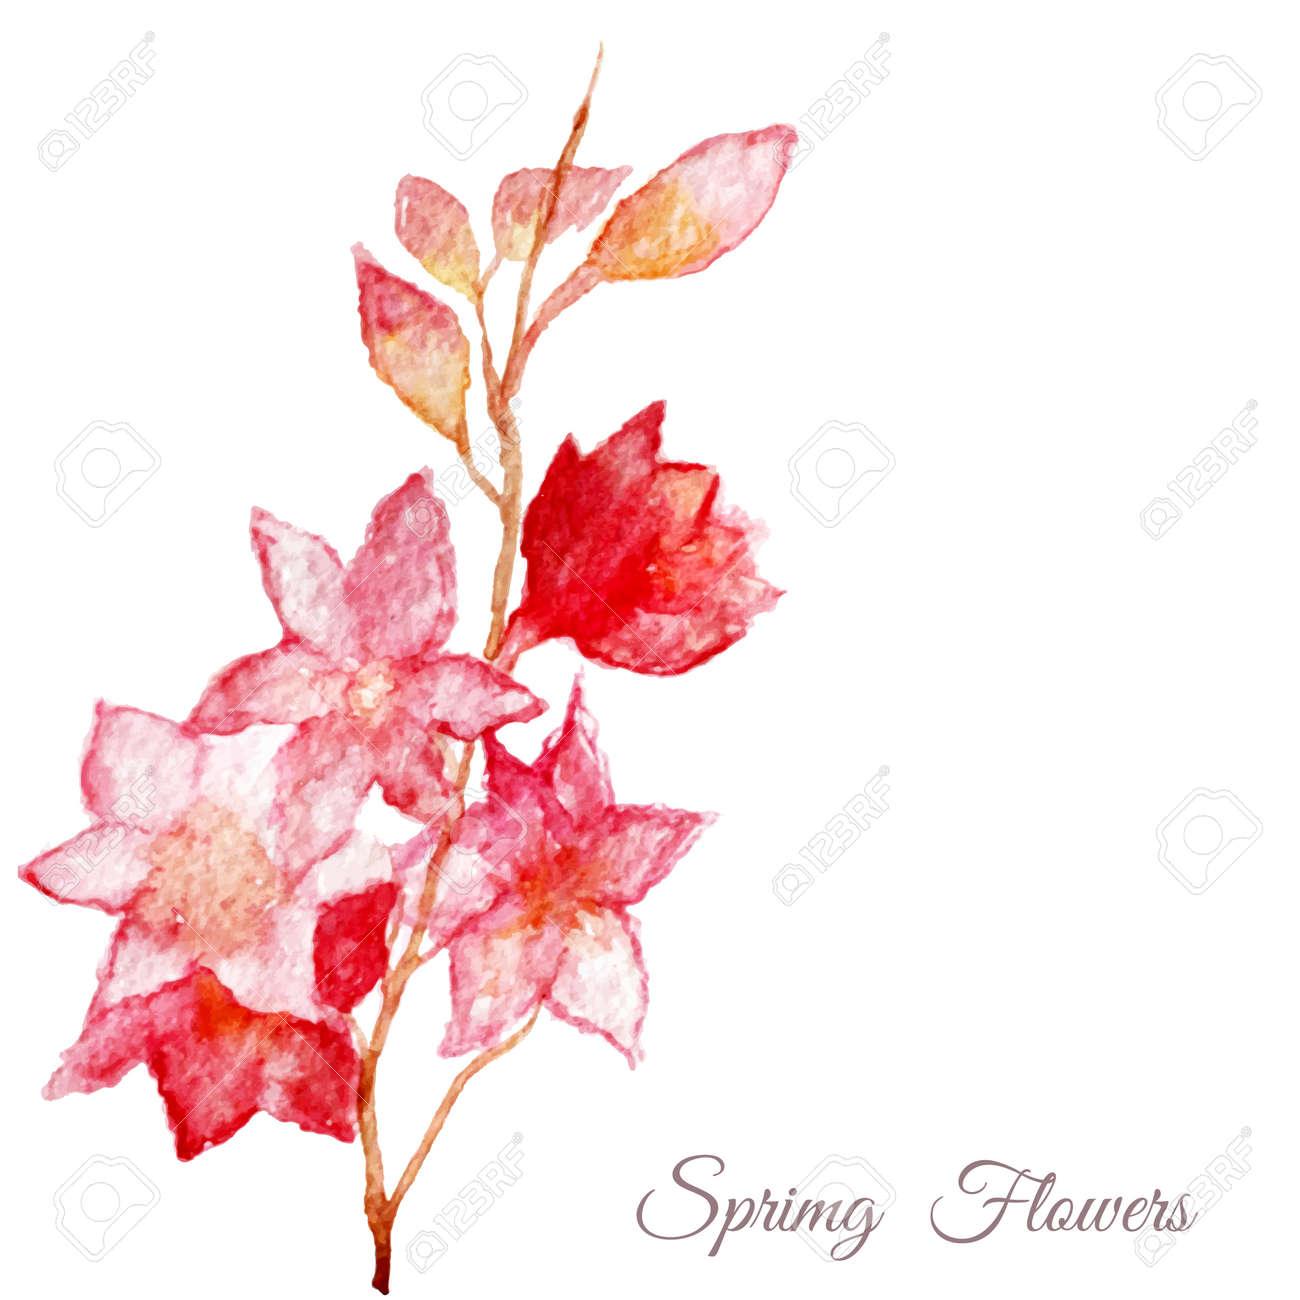 Vecteur Arbre Rose De Pomme Sakura Fleurs De Cerisier Dessin